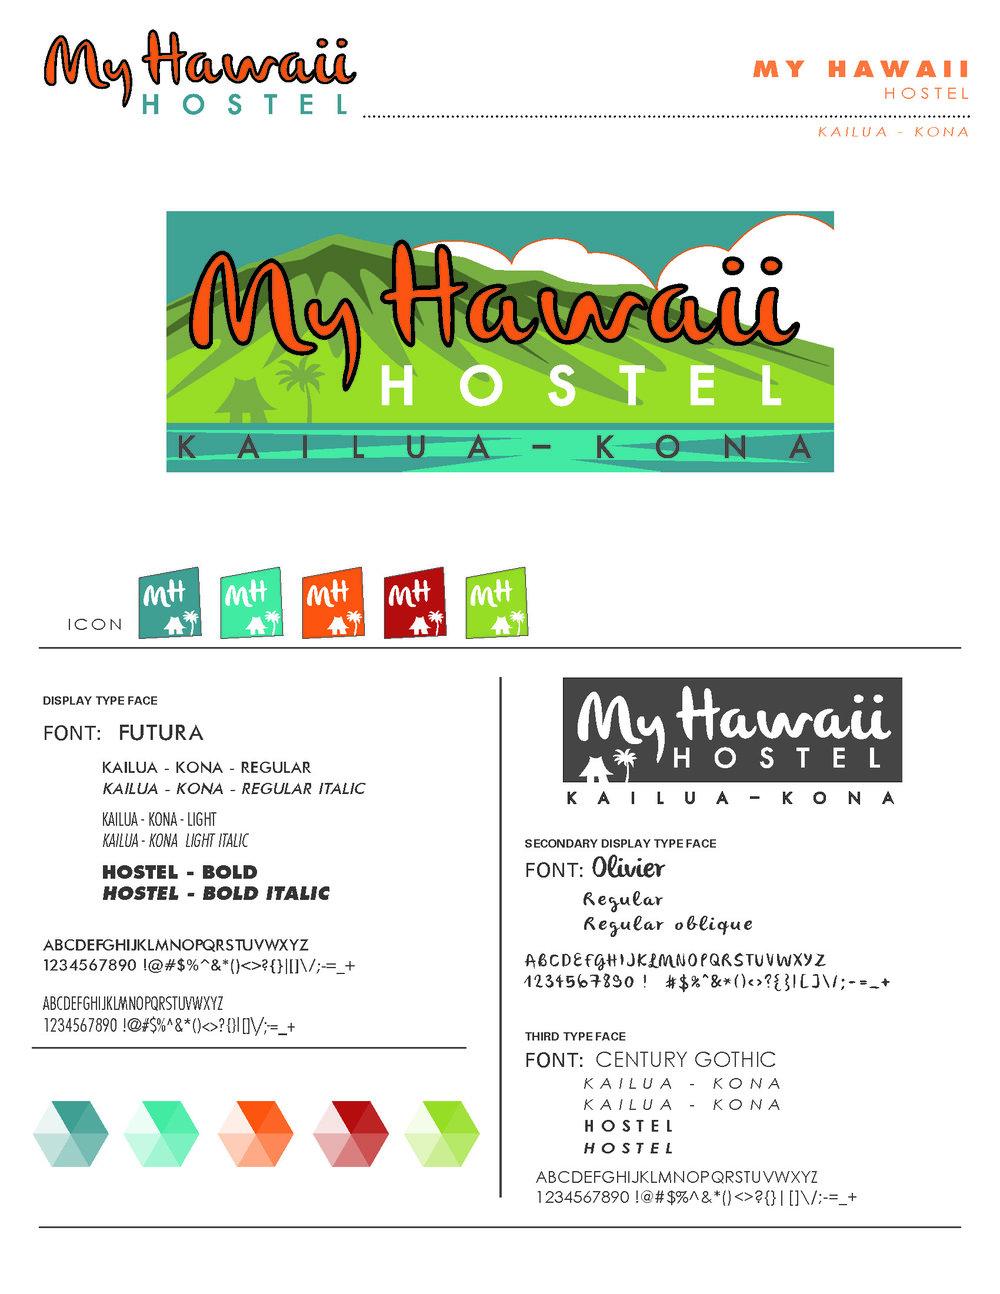 MyHawaii_styleguide_3-15-16.jpg